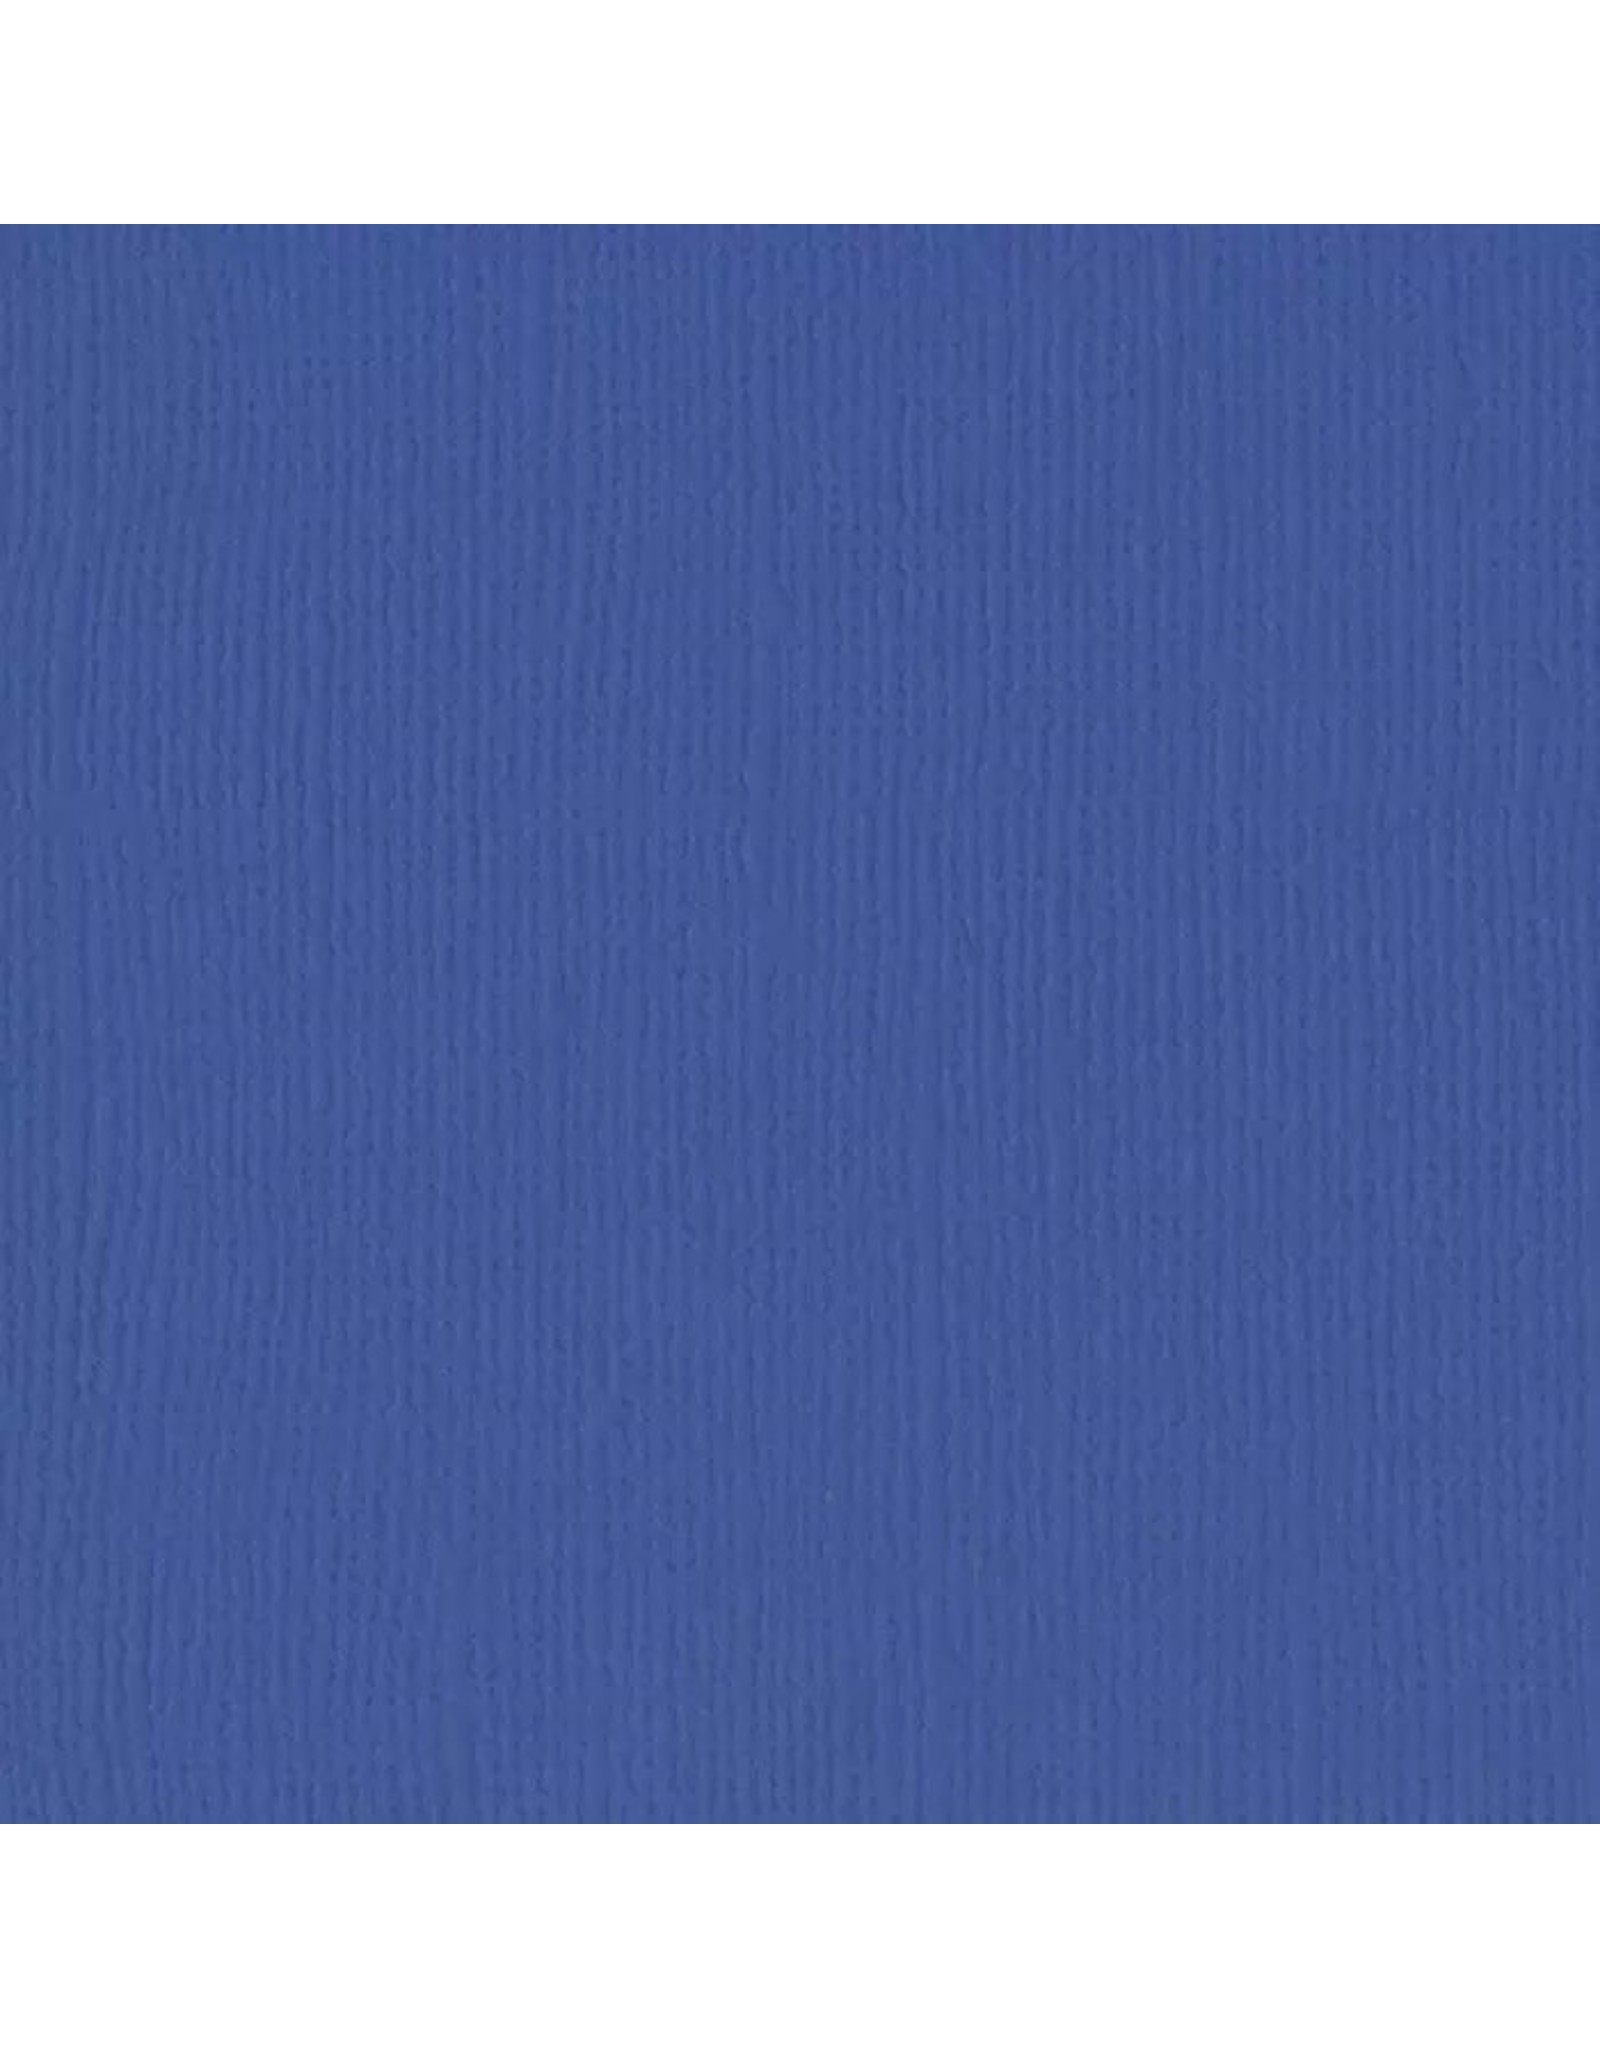 Vaessen Creative Florence • Cardstock texture 30,5x30,5cm Ink